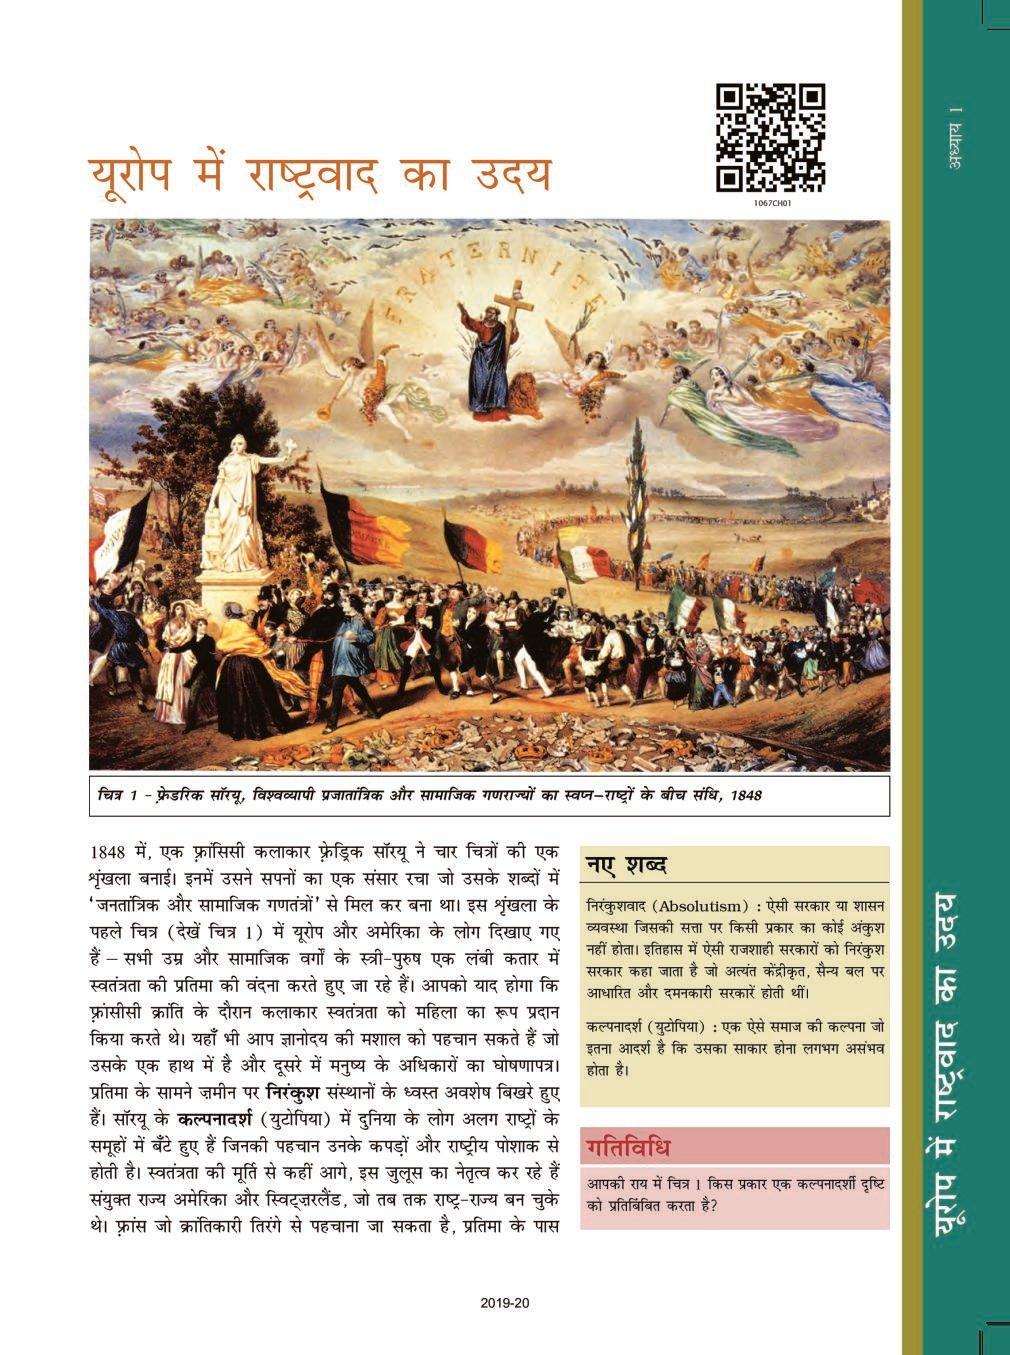 NCERT Book Class 10 Social Science (इतिहास) Chapter 1 यूरोप में राष्ट्रवाद का उदय - Page 1